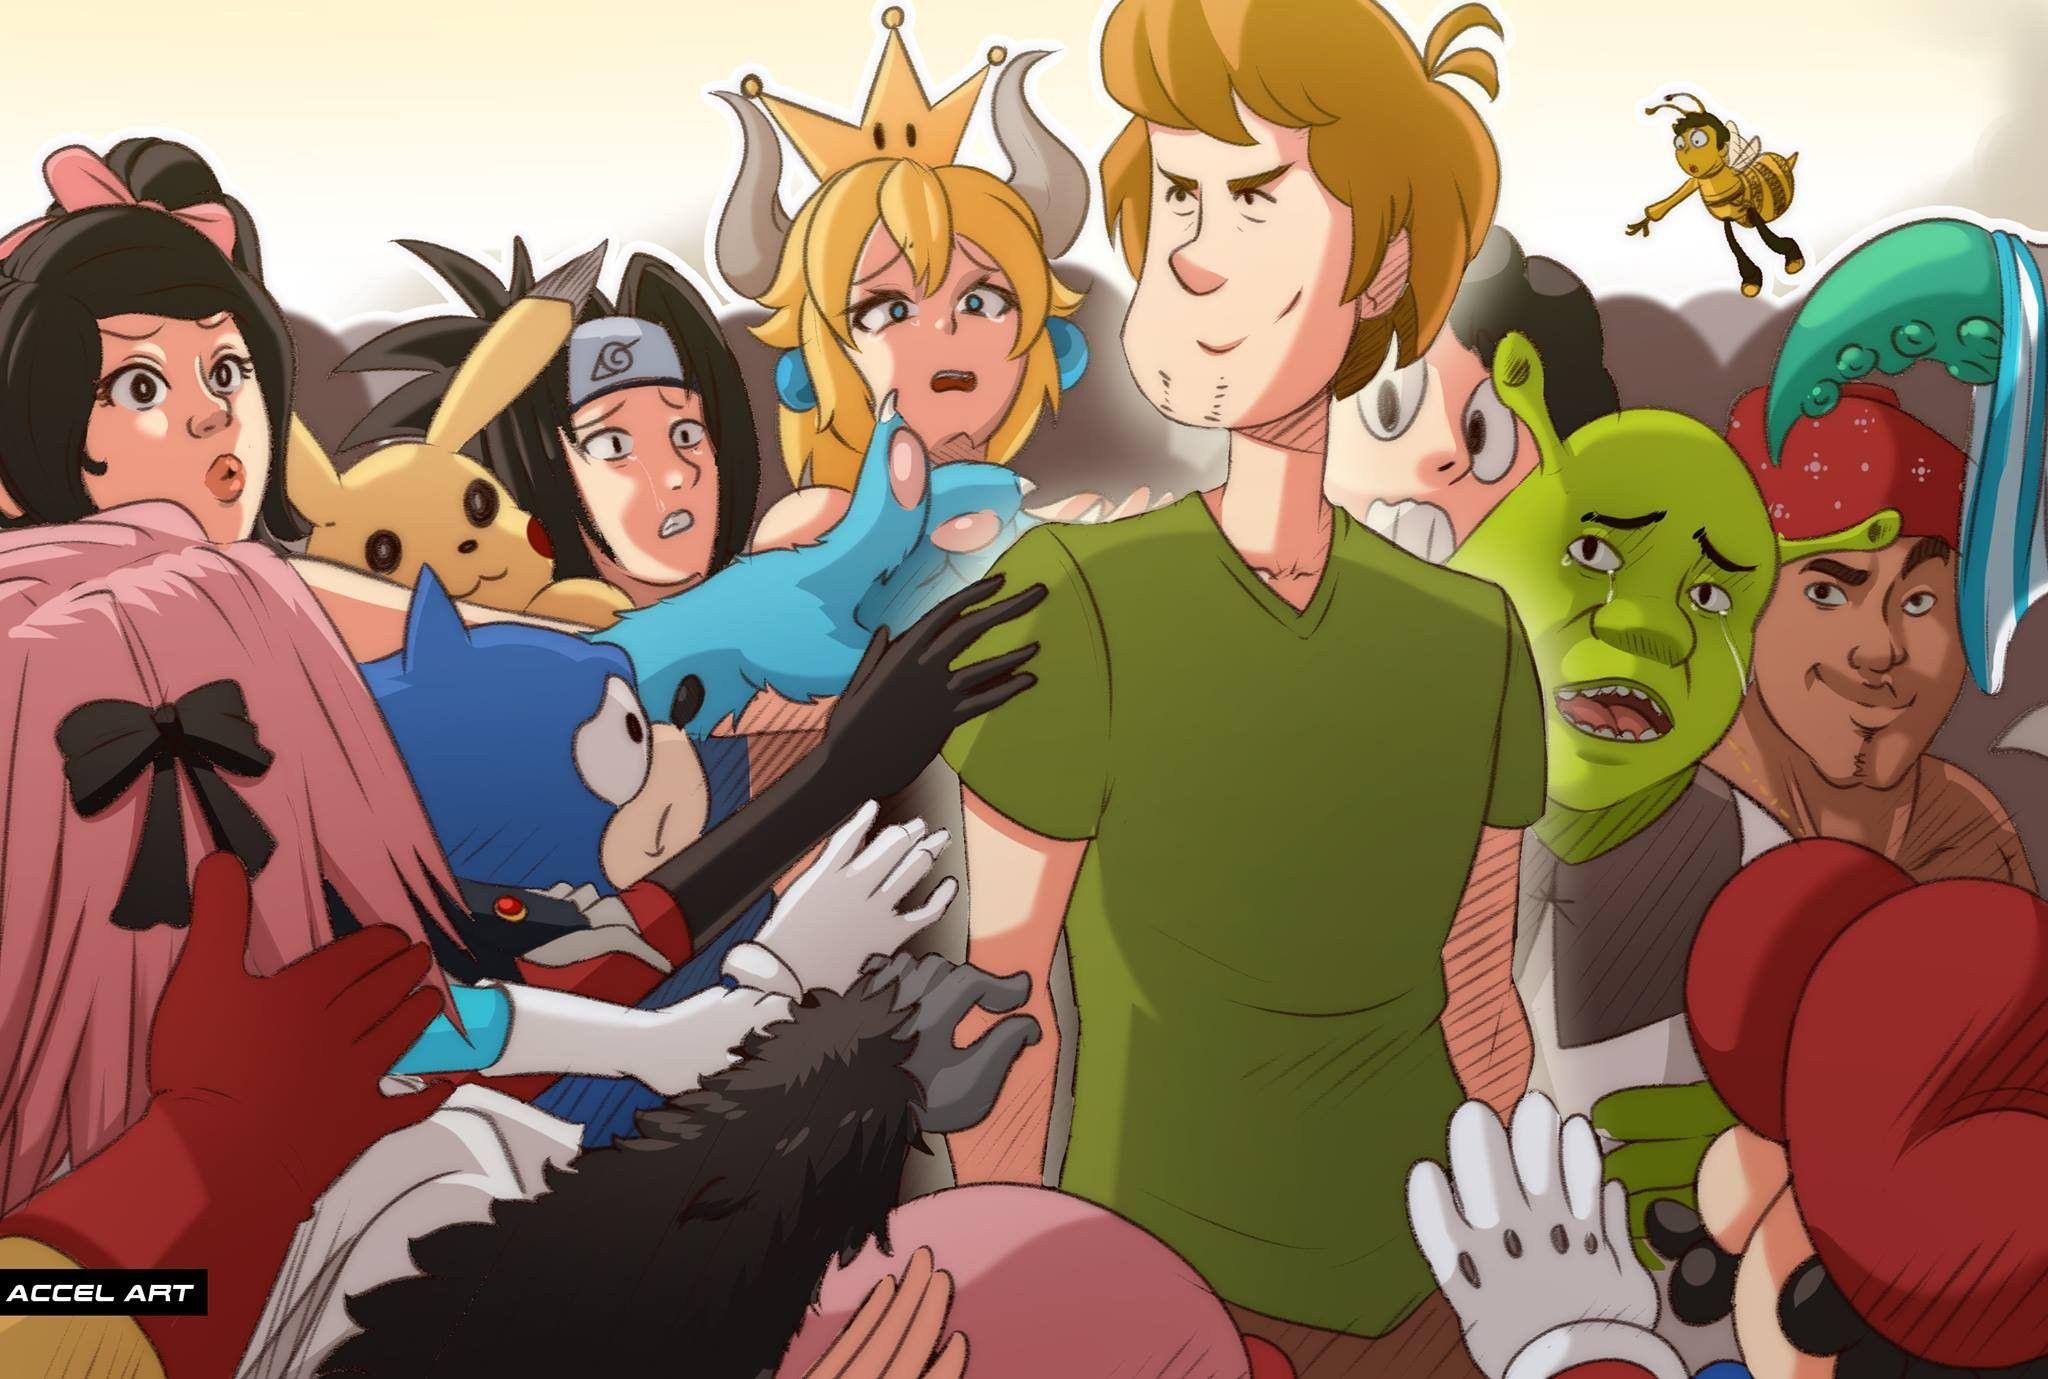 Shaggy Scooby Doo Anime